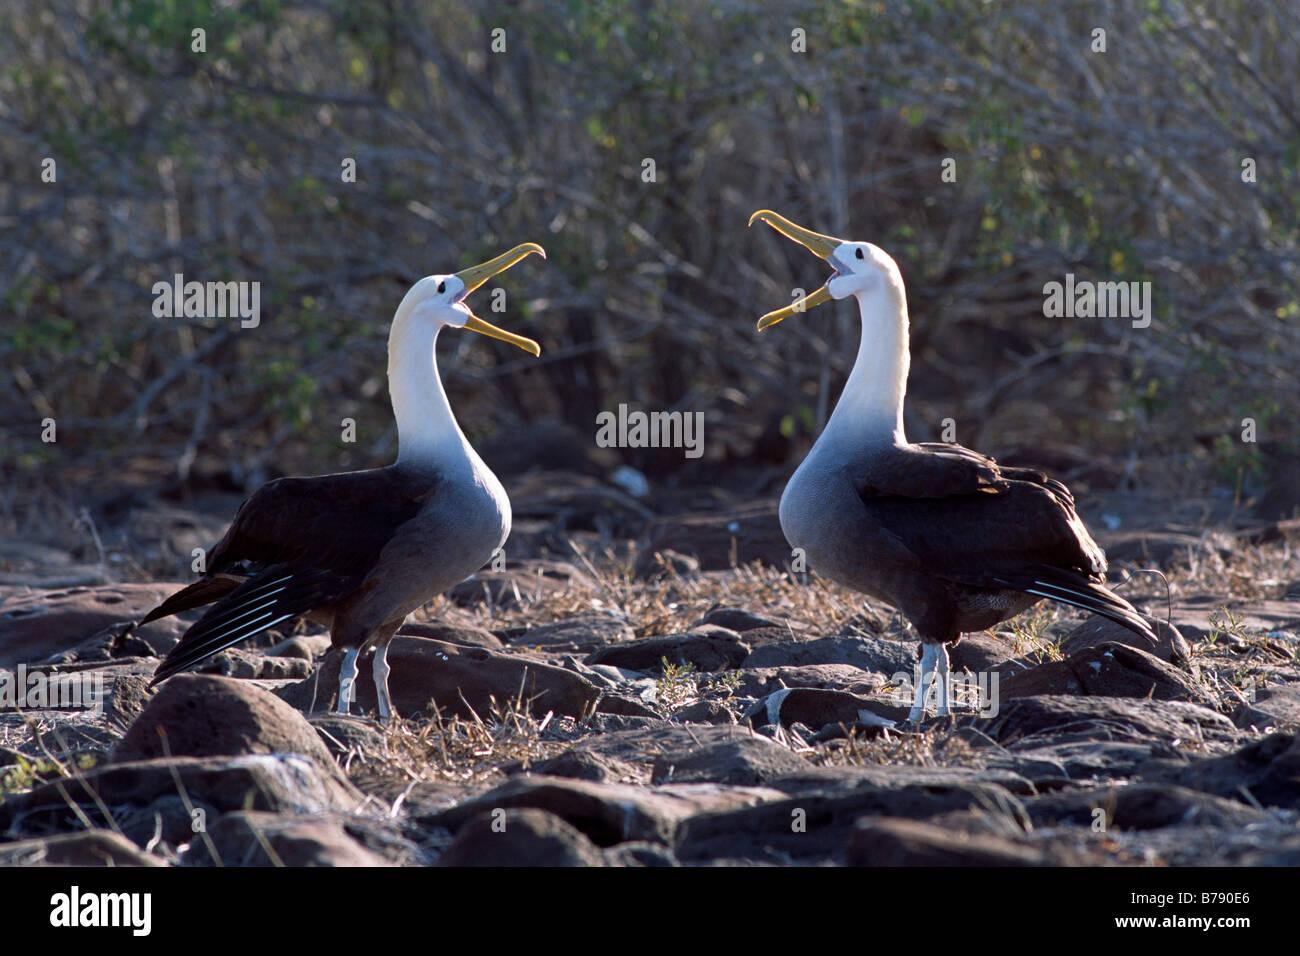 Waved Albatross pair (Diomedea irrorata) courtship dance, Insel Espanola, Galapagos Inseln, Galapagos Islands, Ecuador, - Stock Image